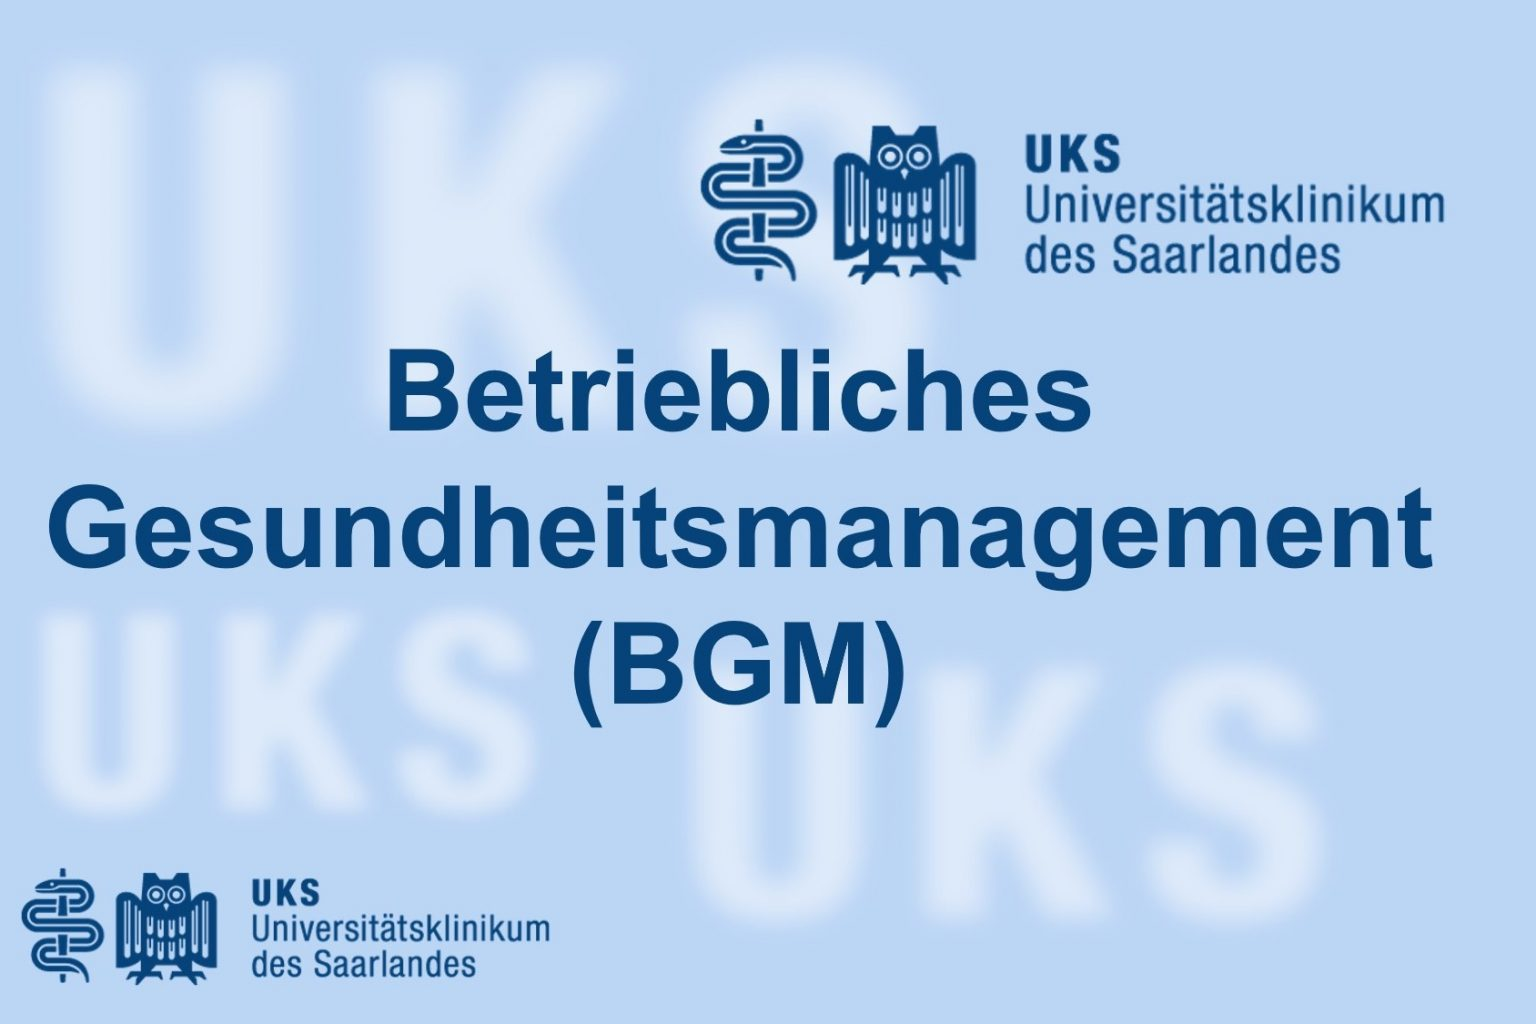 Feedback BGM UKS 1 1536x1024 1